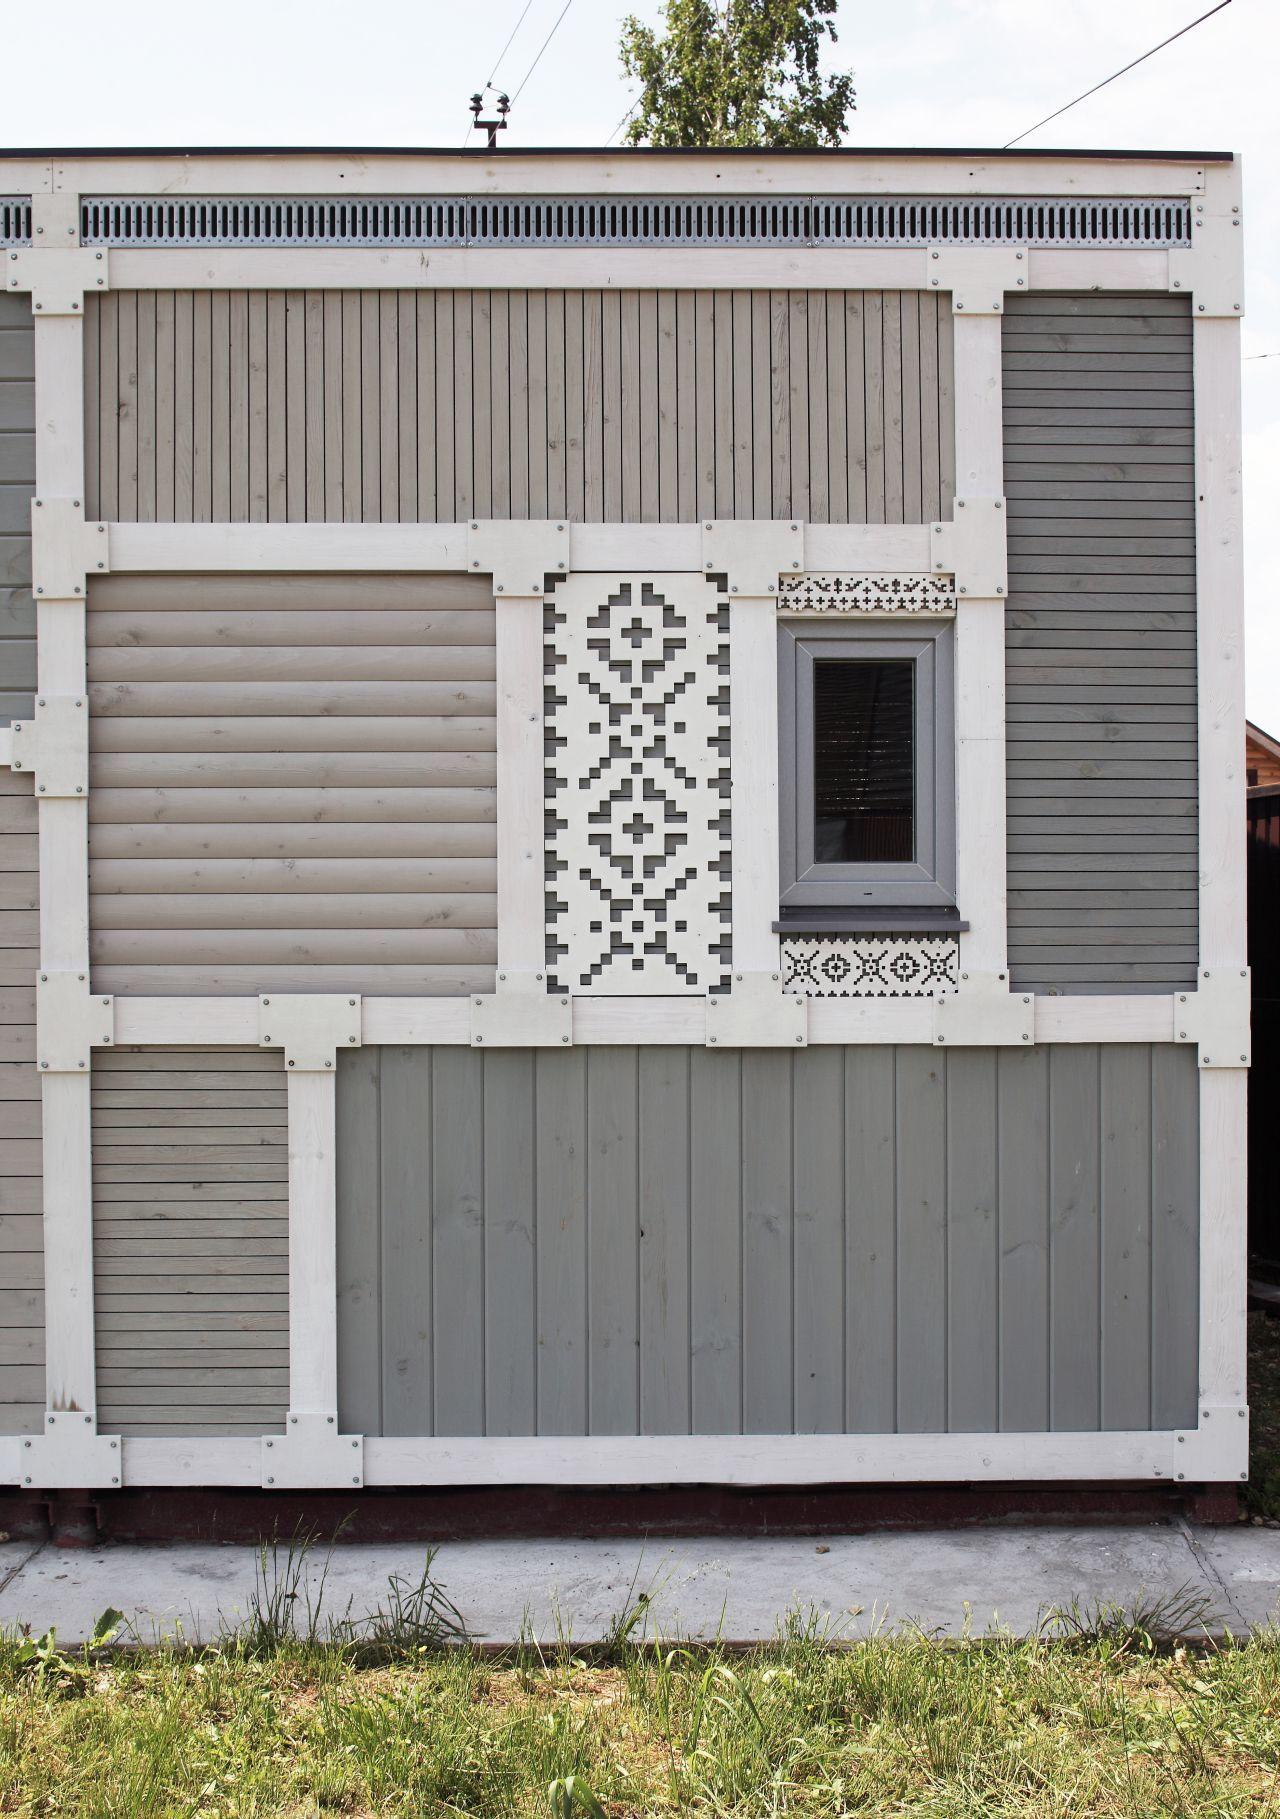 51ef0de9e8e44e6da3000081_deco-pattern-house-peter-kostelov_kostelov_deco_pattern_facade_016